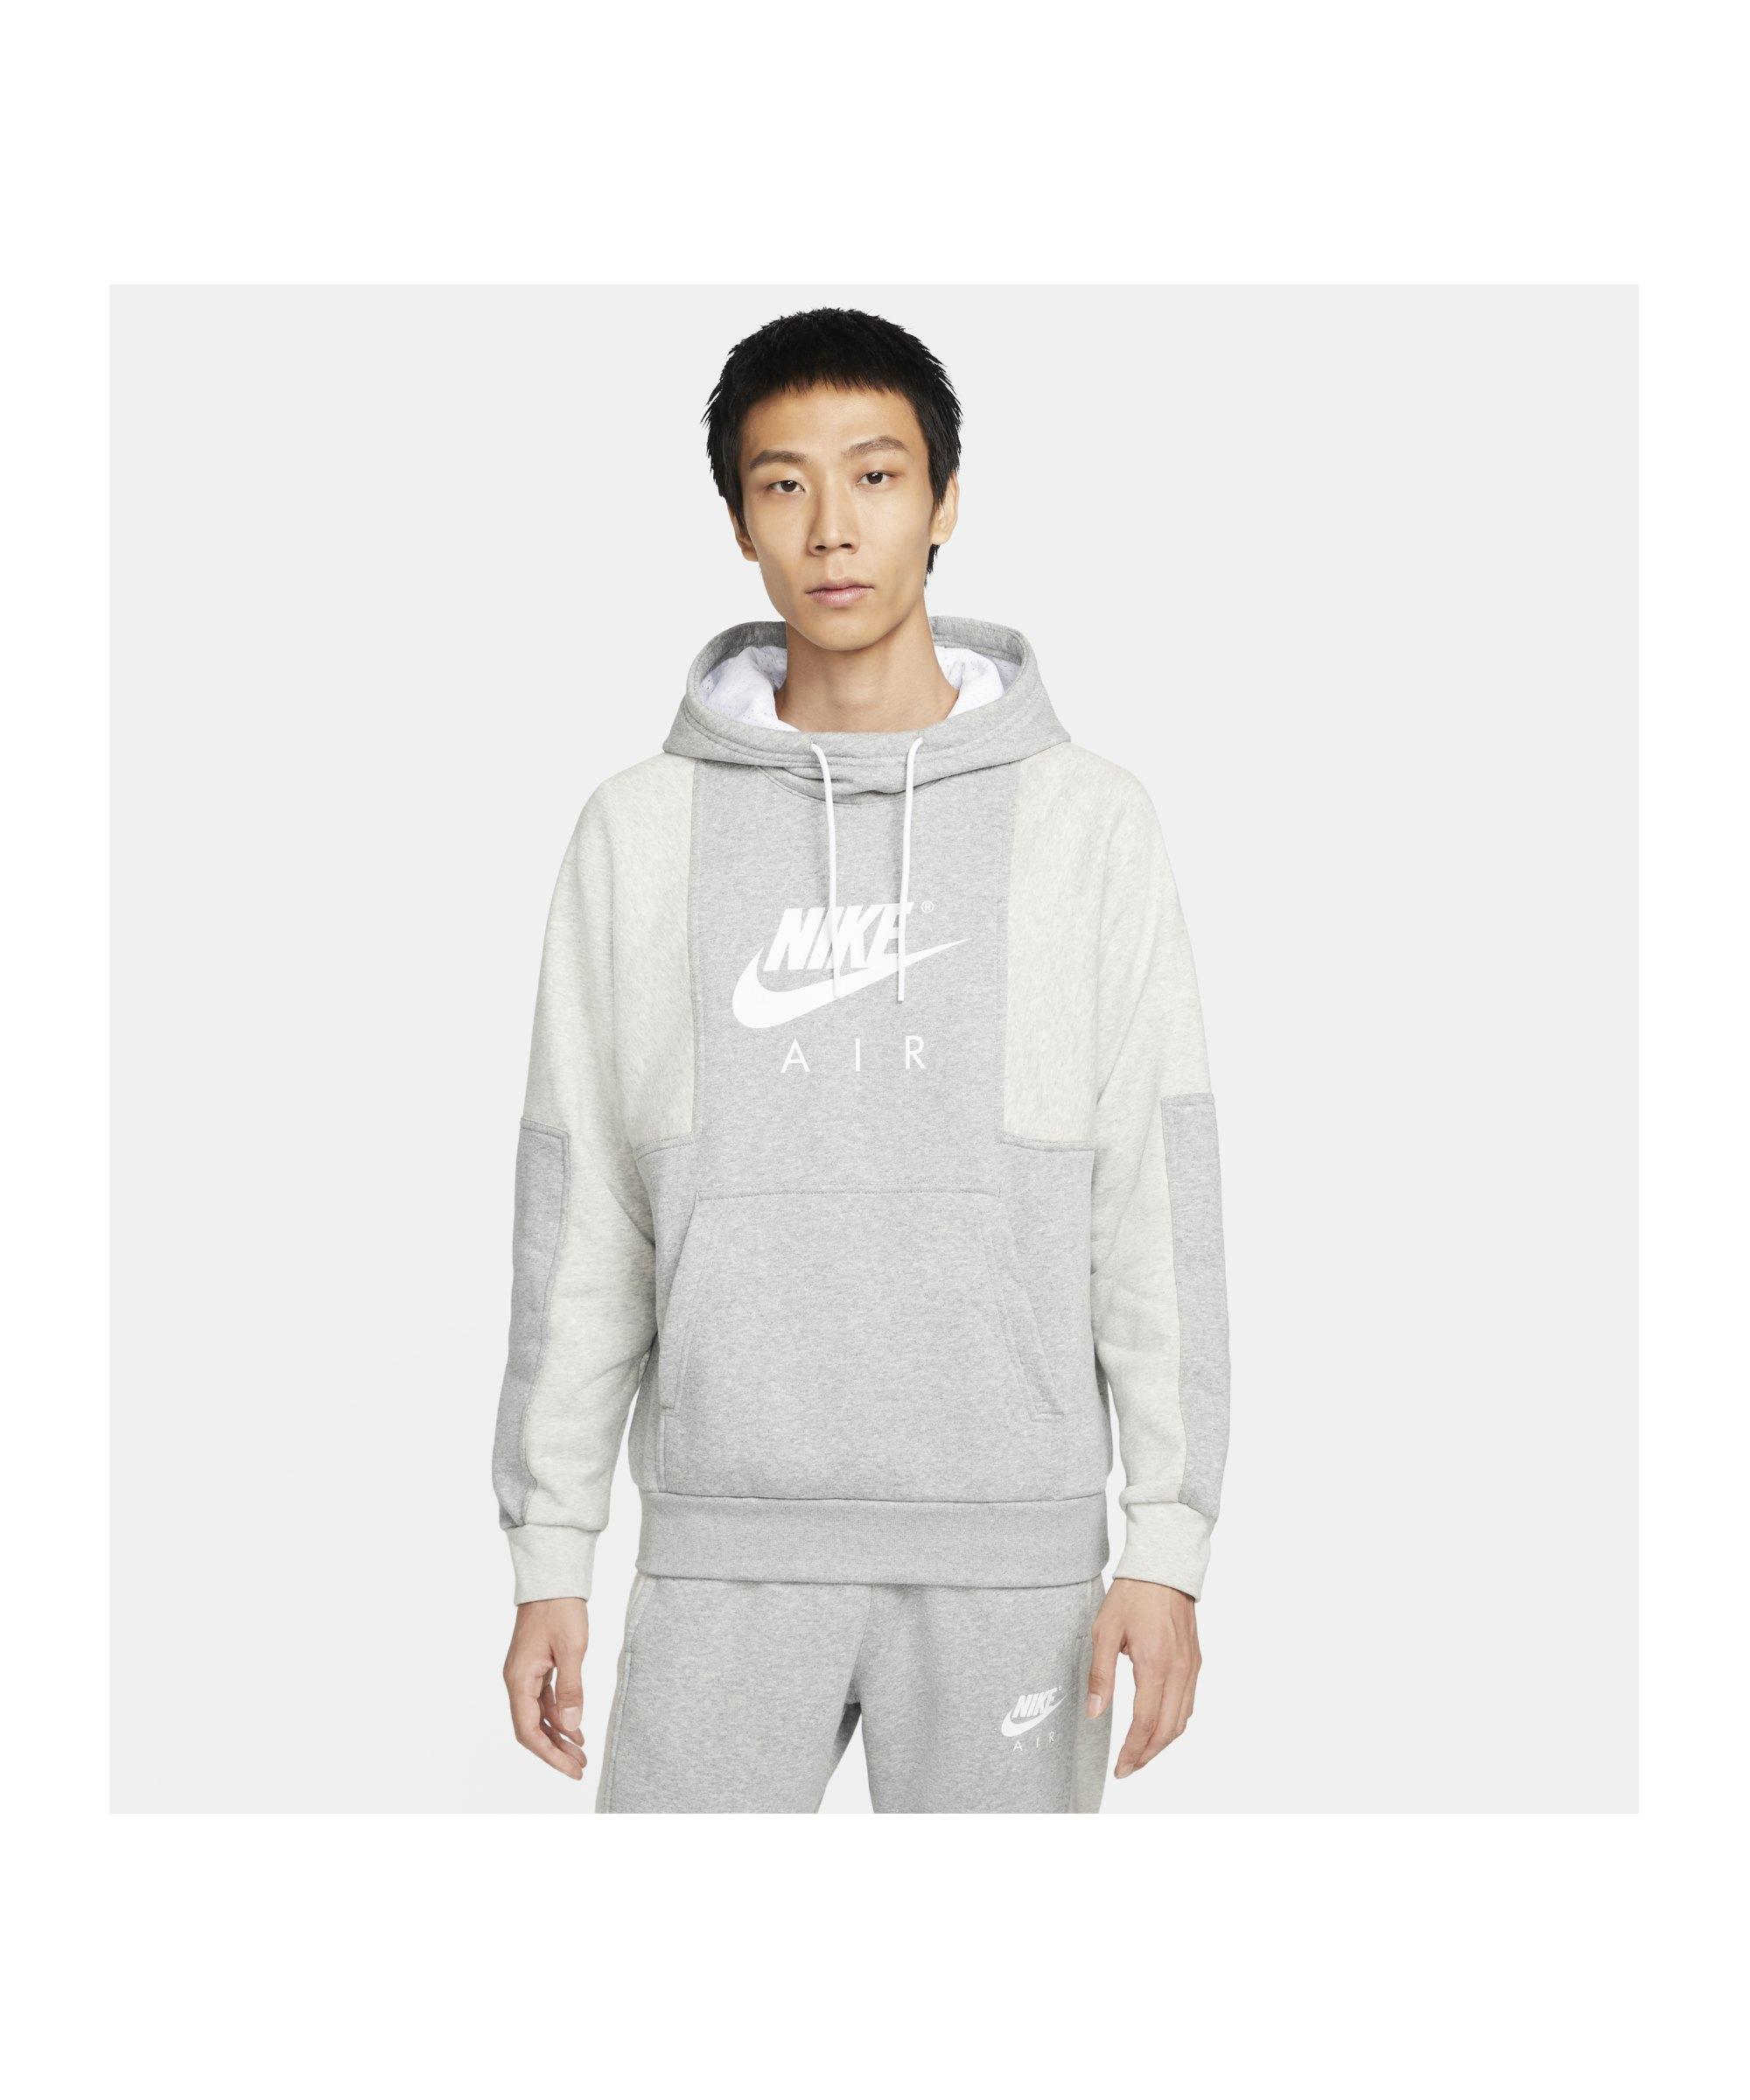 Nike Air Brushed-Back Fleece Hoody Grau F063 - grau